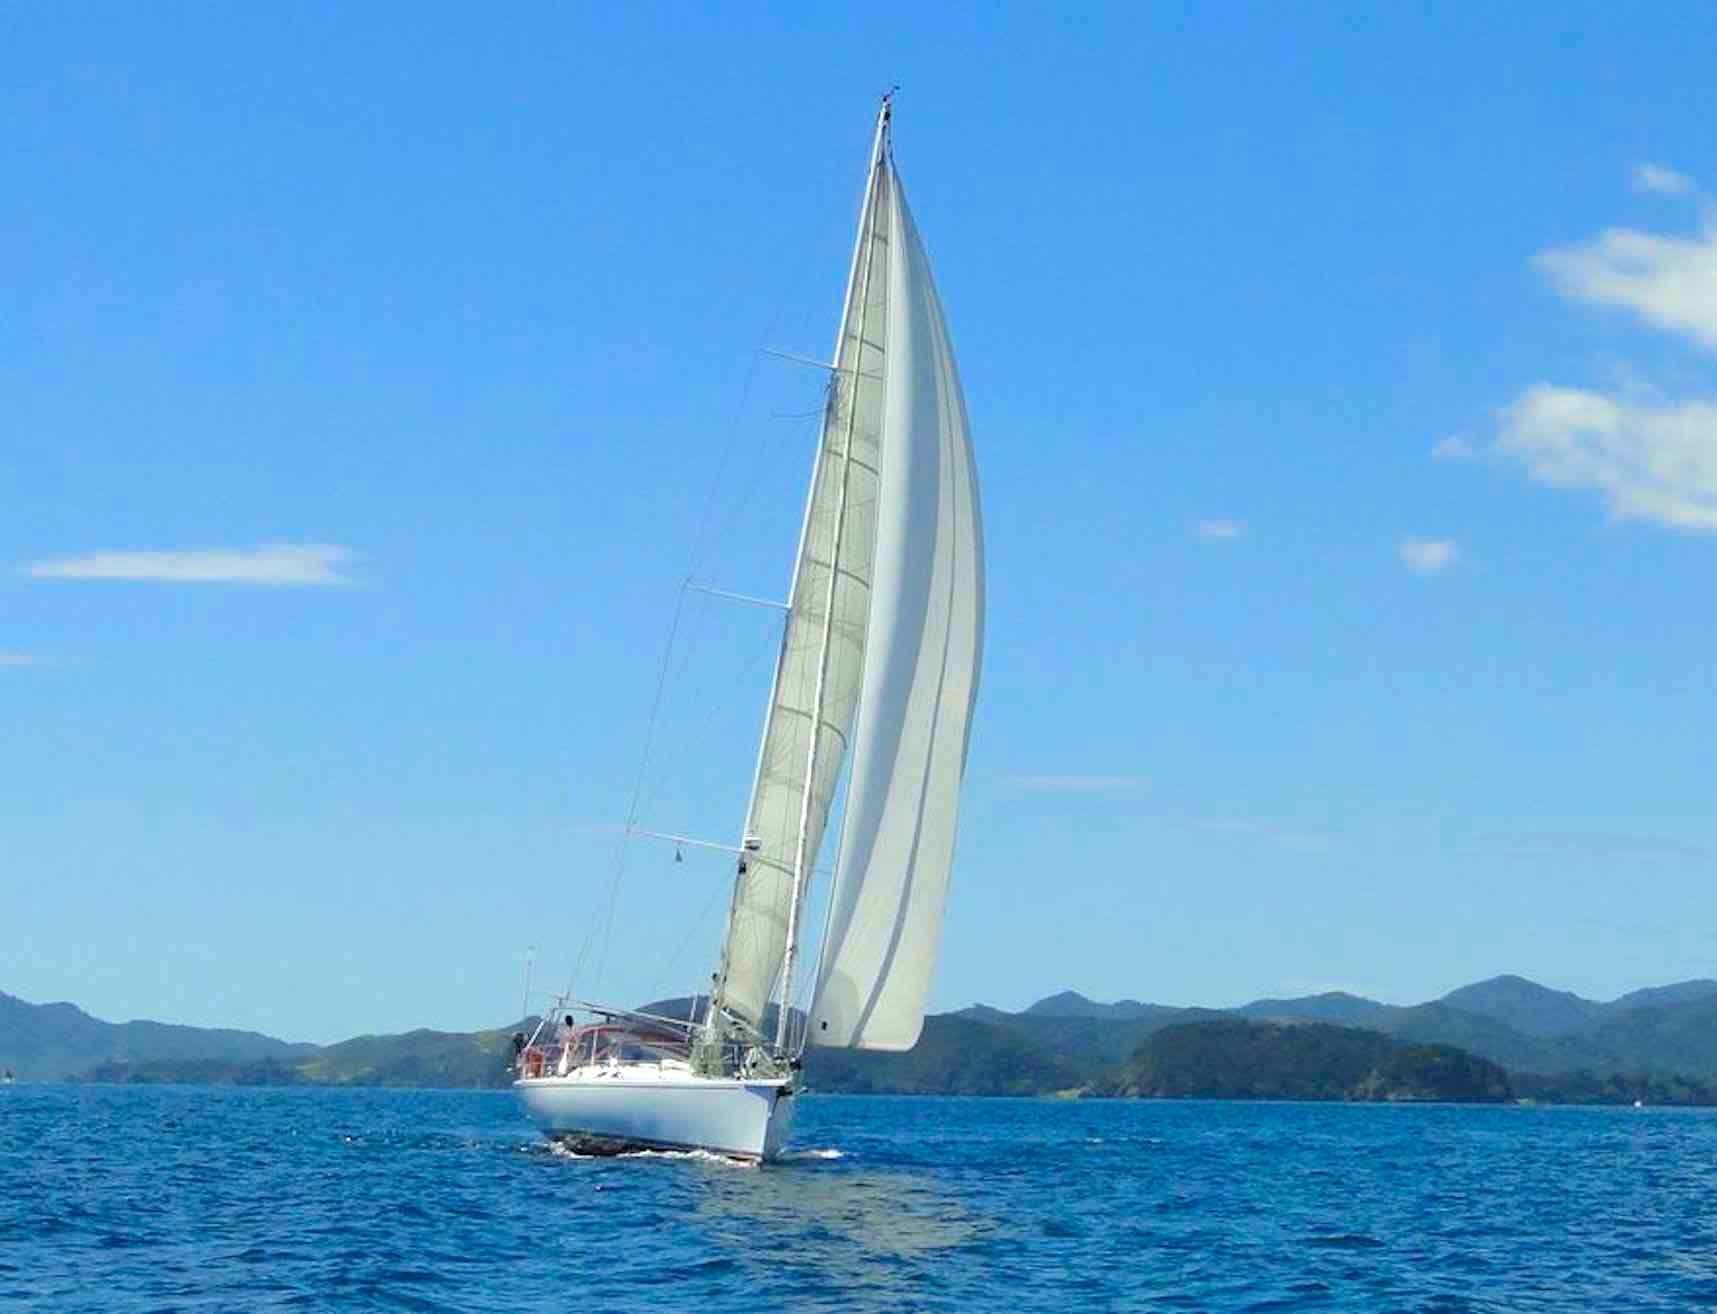 Dalai_white boat under full sail on rippled waters in Mergui Islands_XS.jpeg